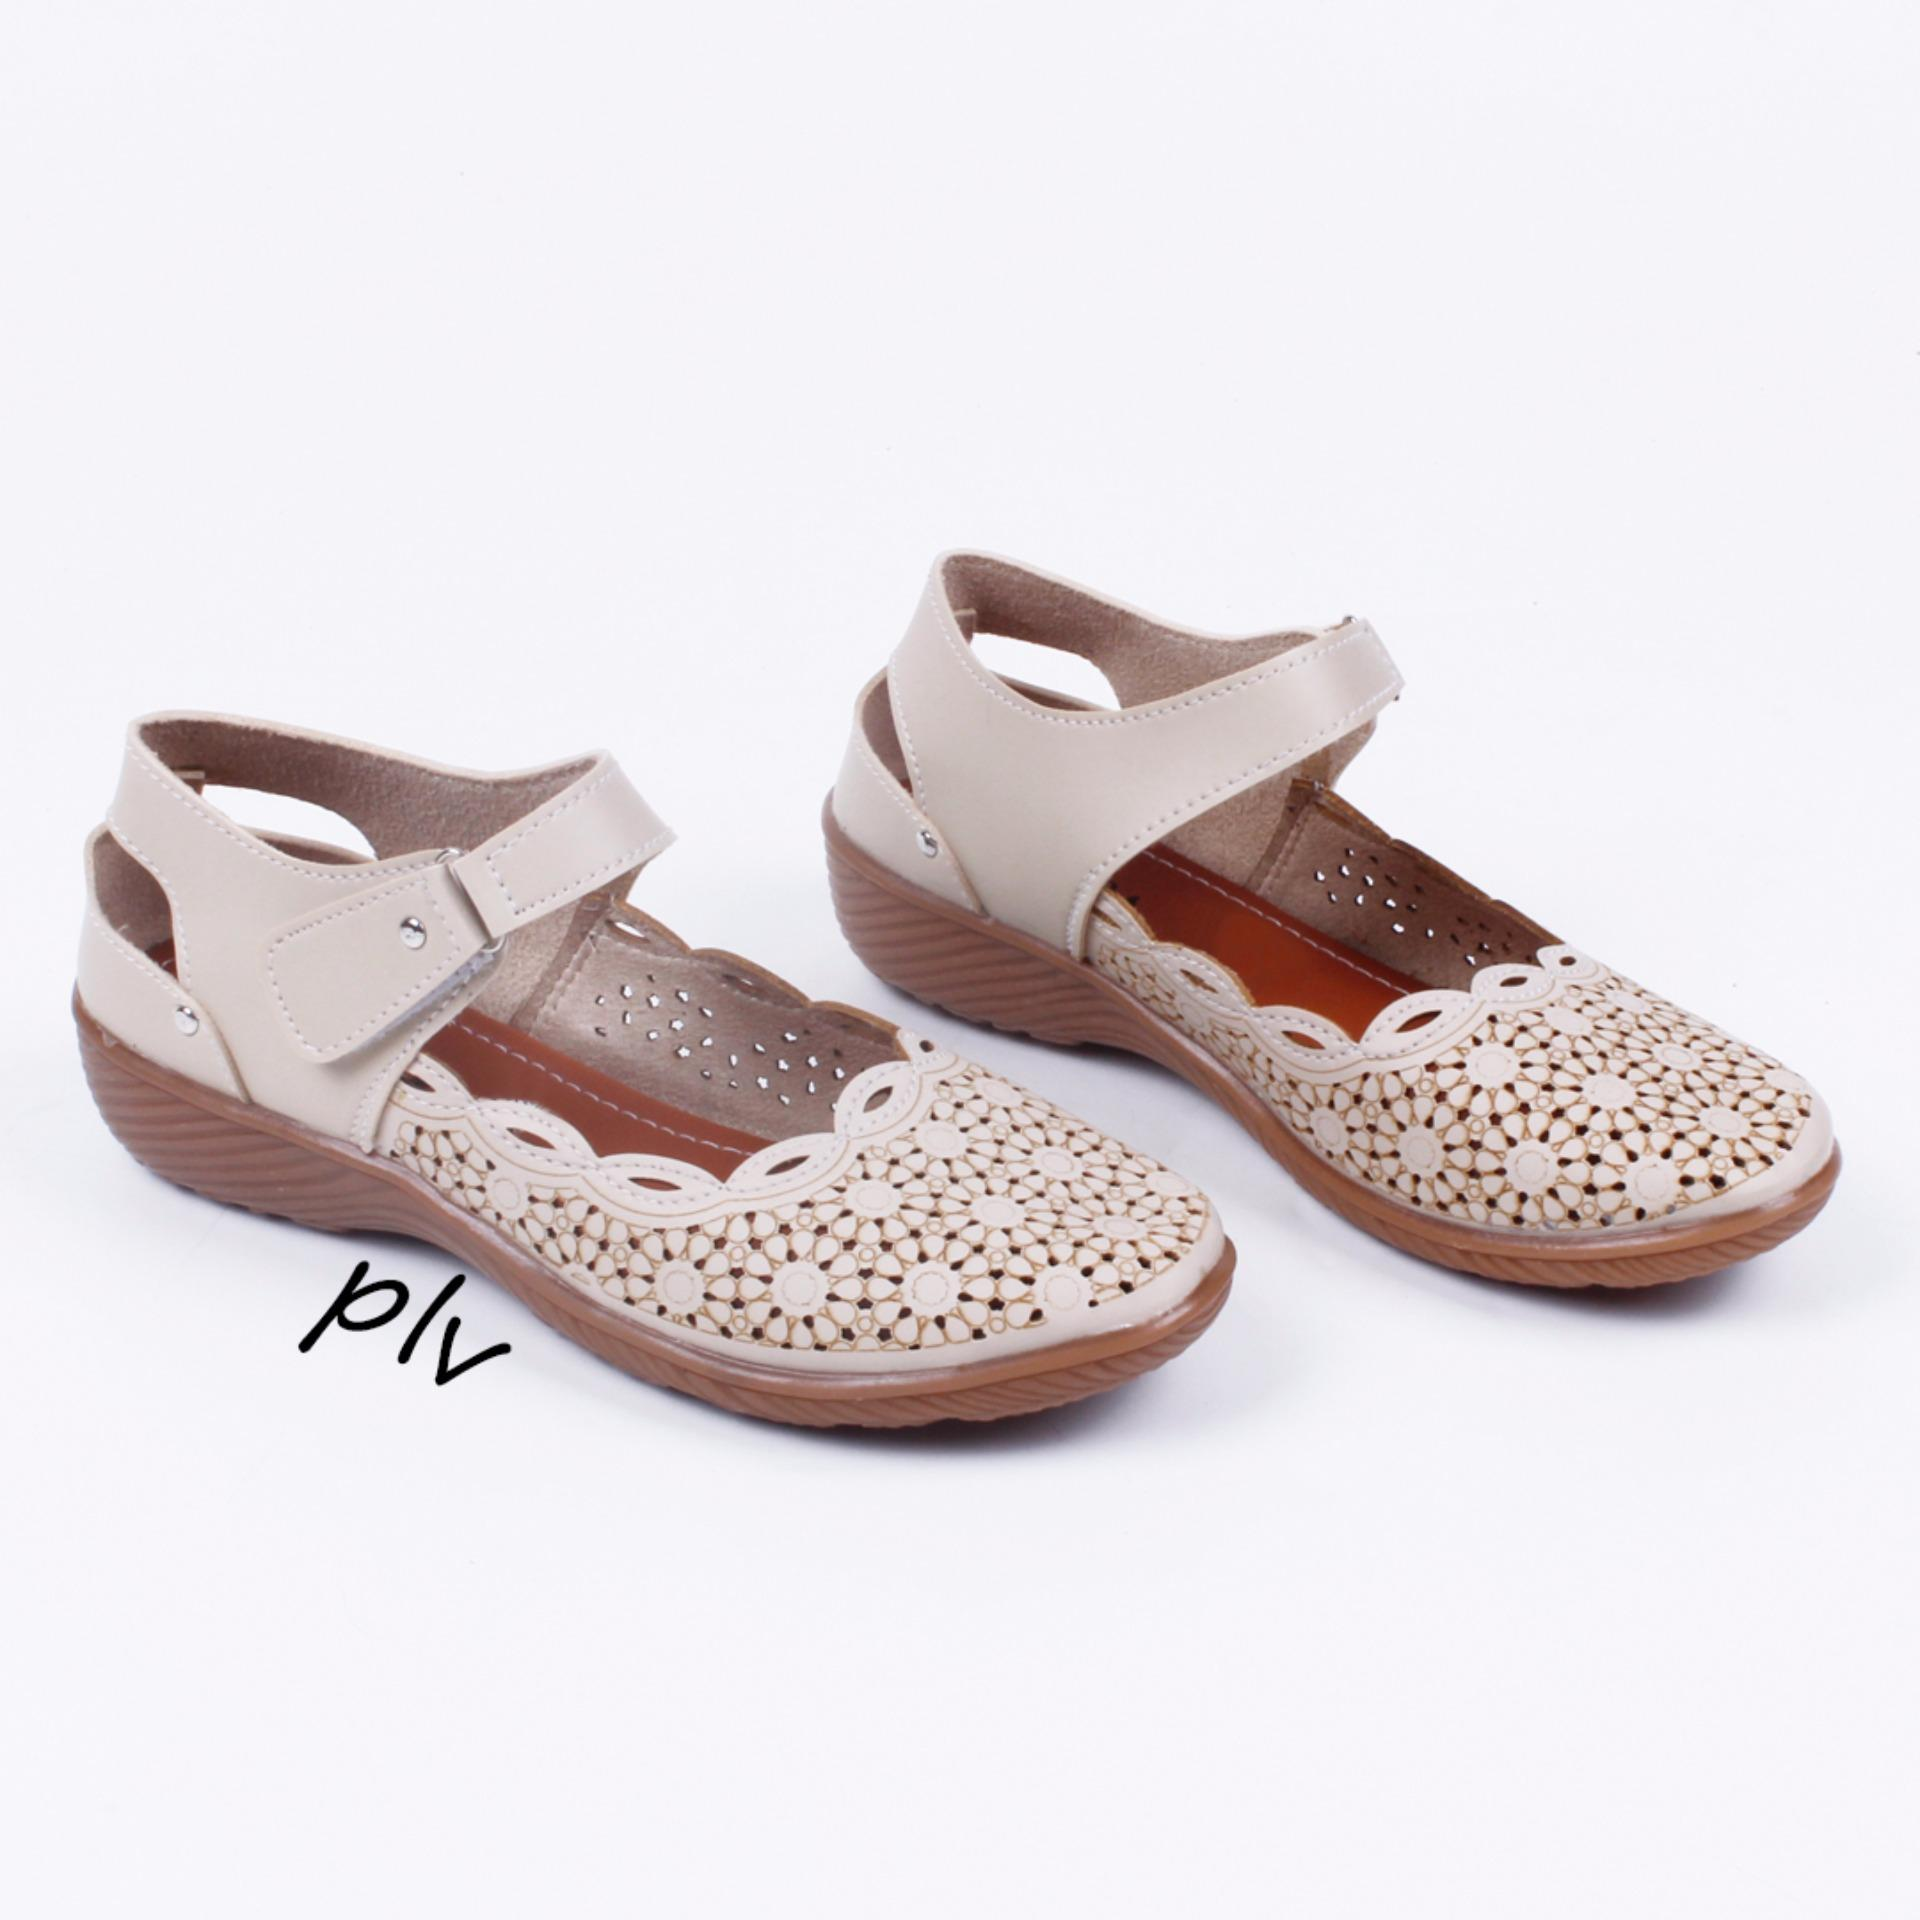 Pluvia - Sepatu Flat Shoes Wanita Terbaru Mary Jane Laser MY13 - Cream